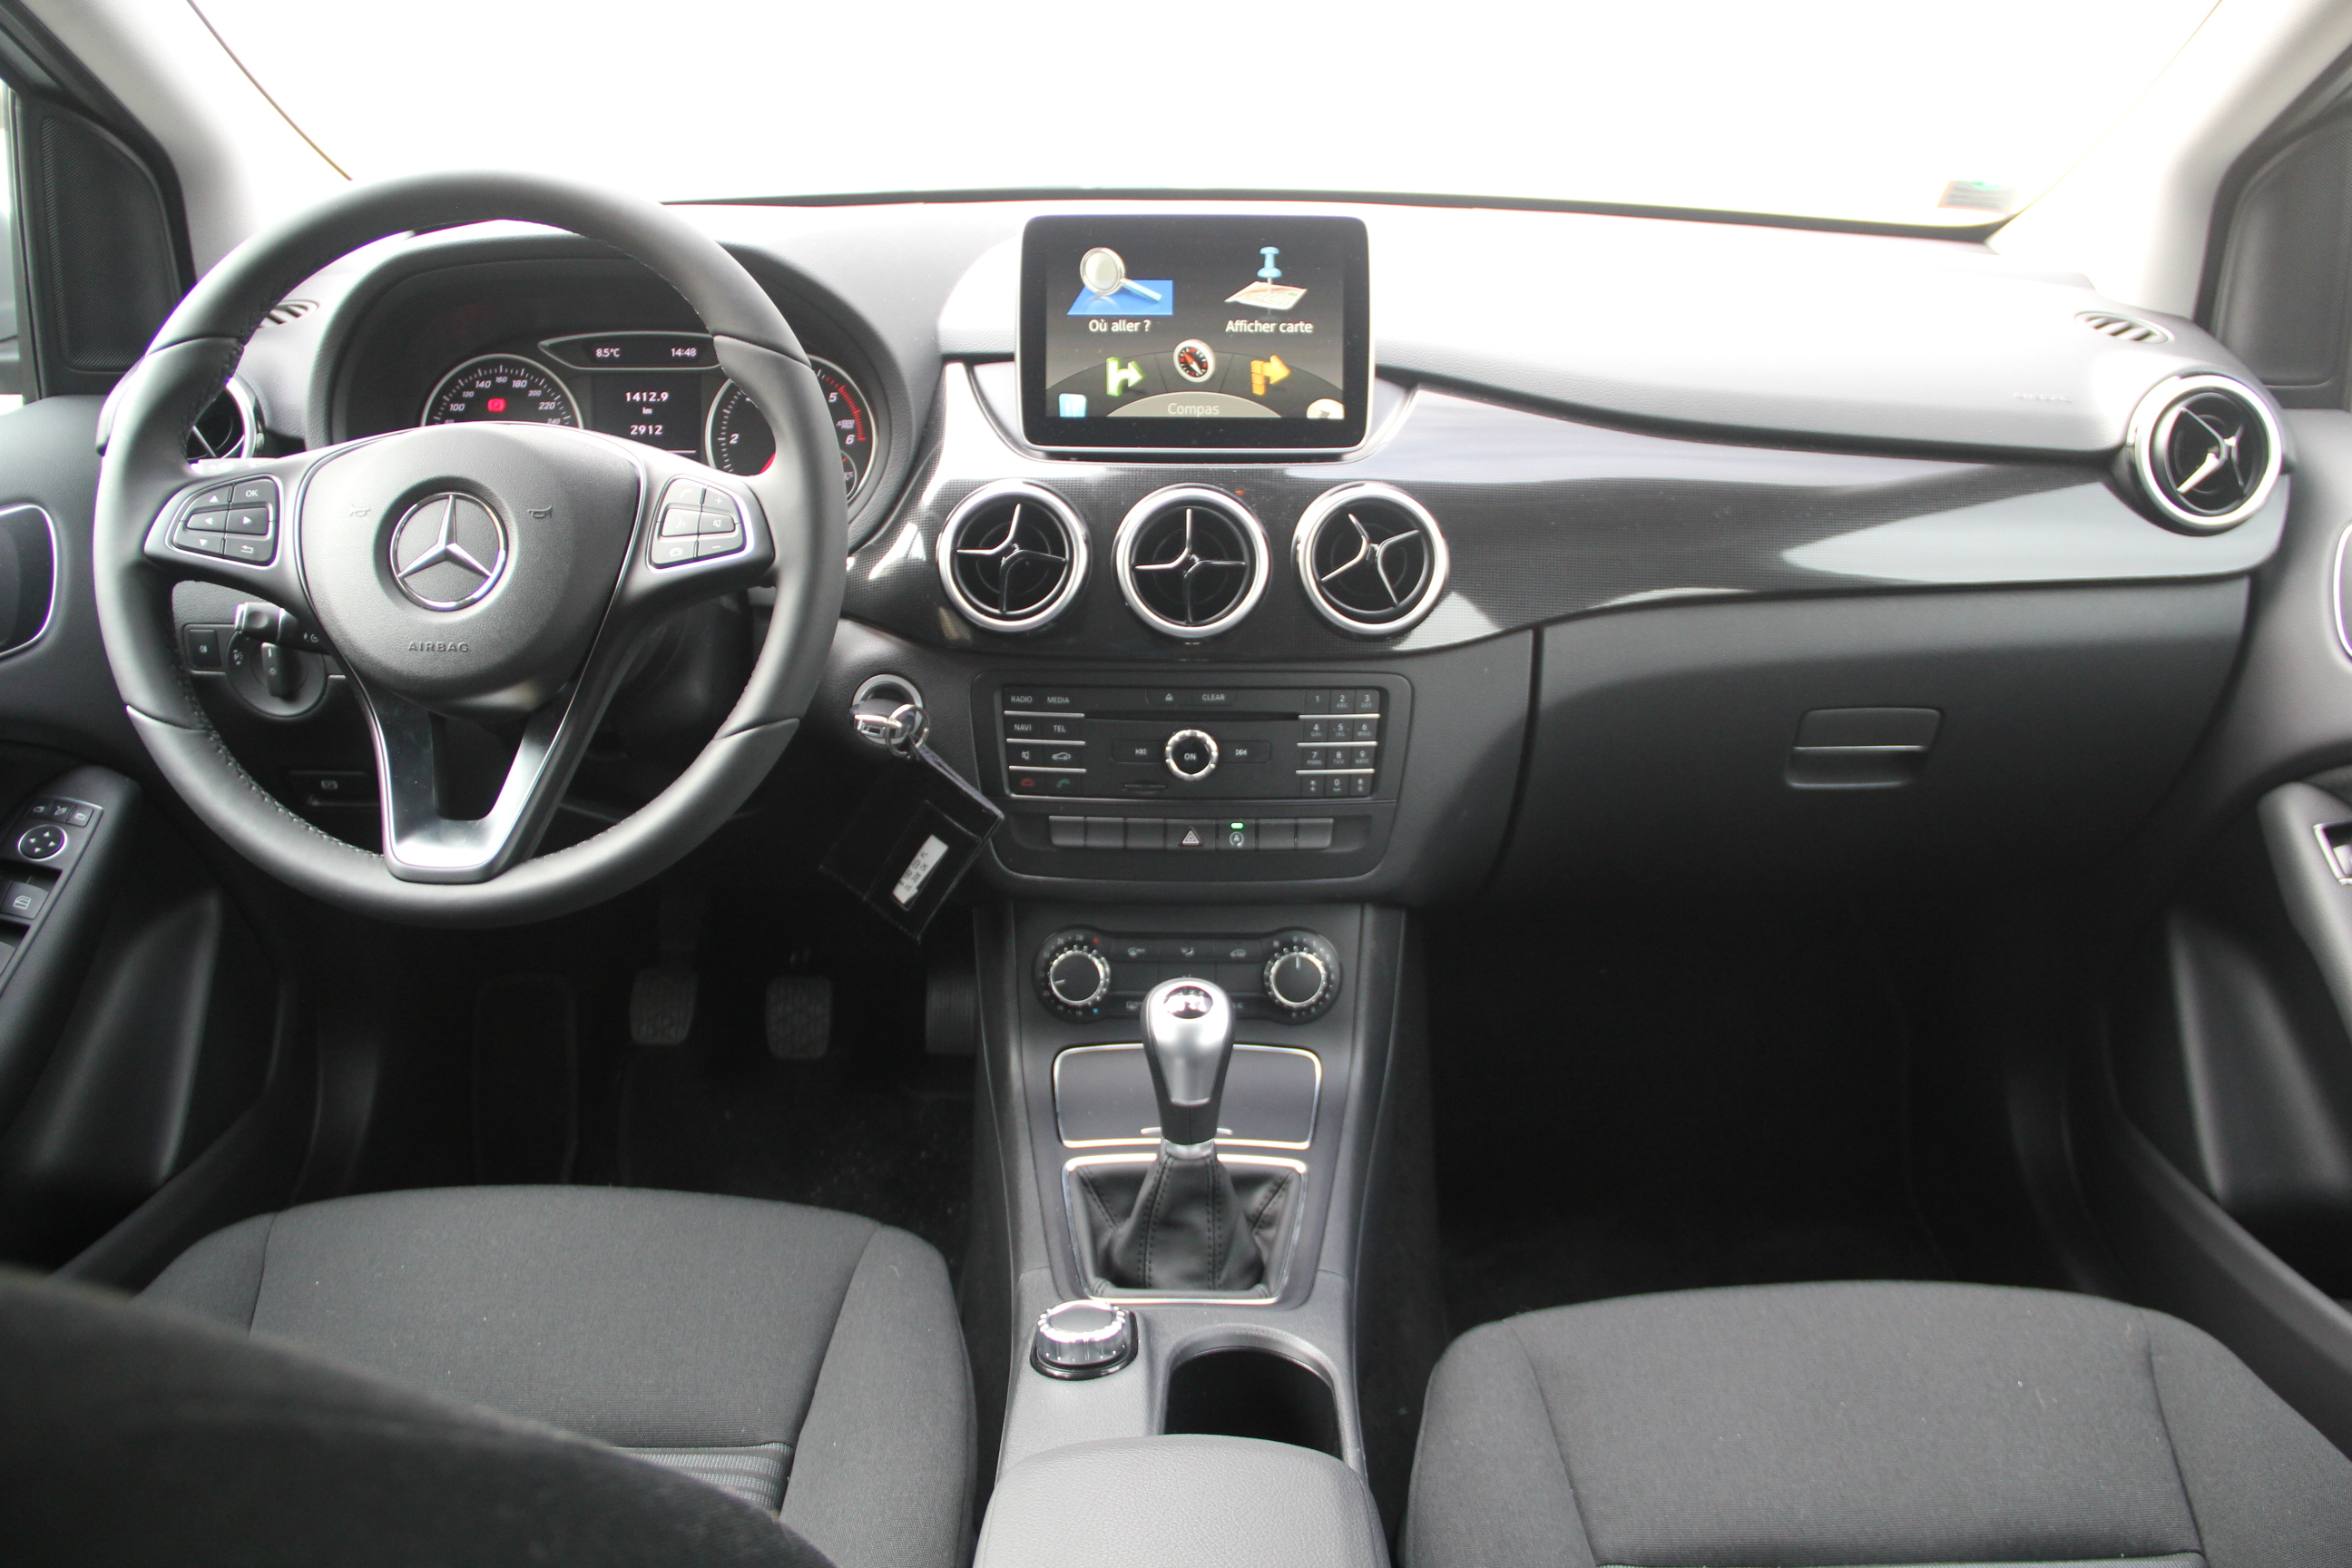 Essai Mercedes B160 Cdi Du Premium Vraiment